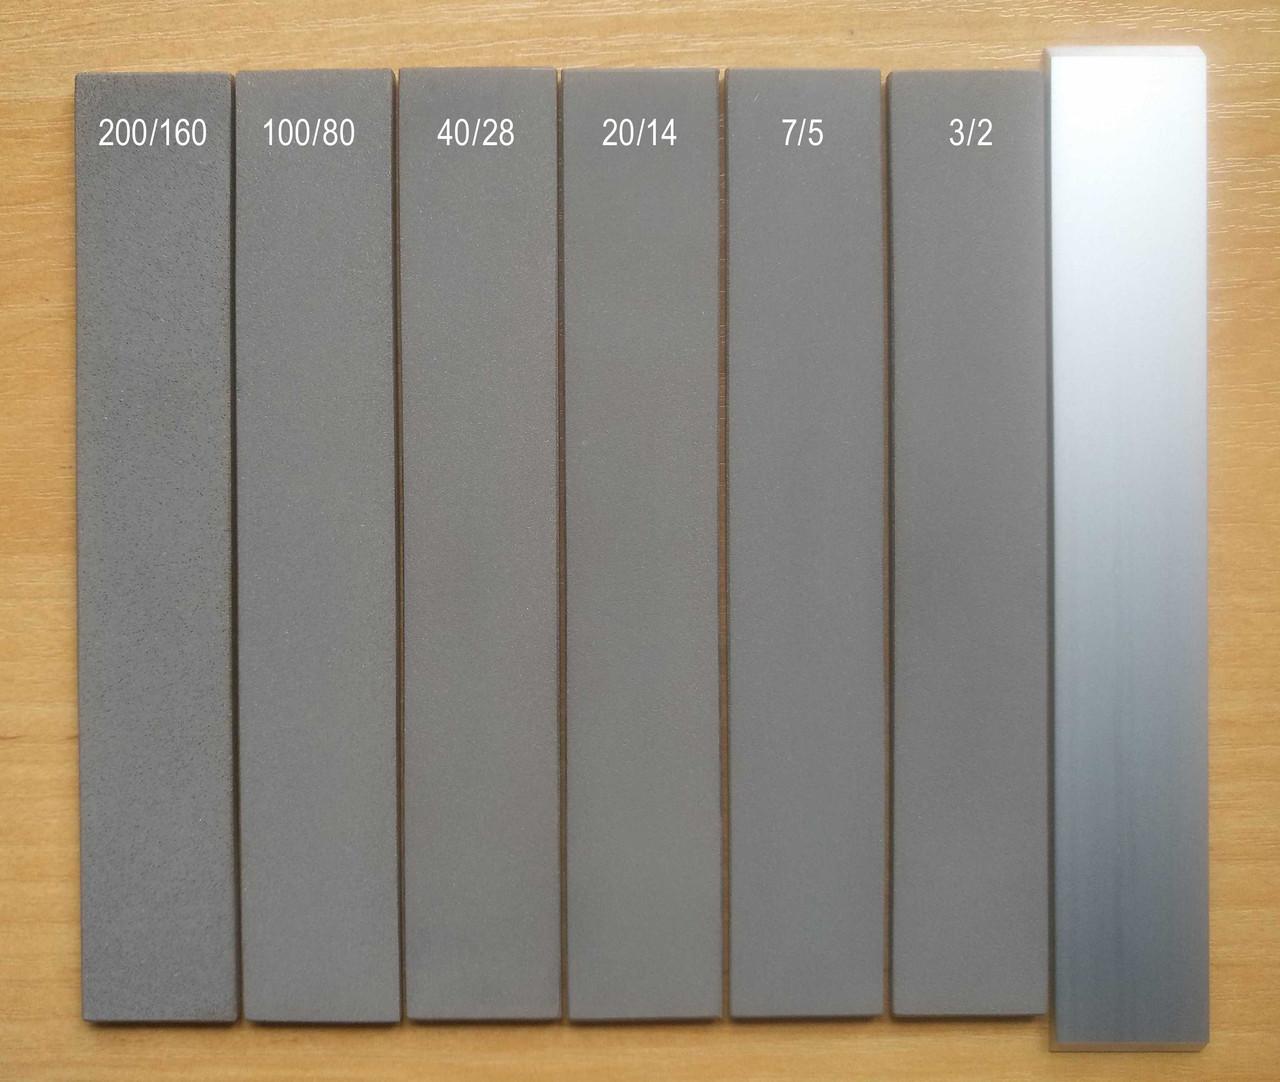 Брусок Эльборовый ПРЕМИУМ 150х25х3 зер.3/2 для ножа